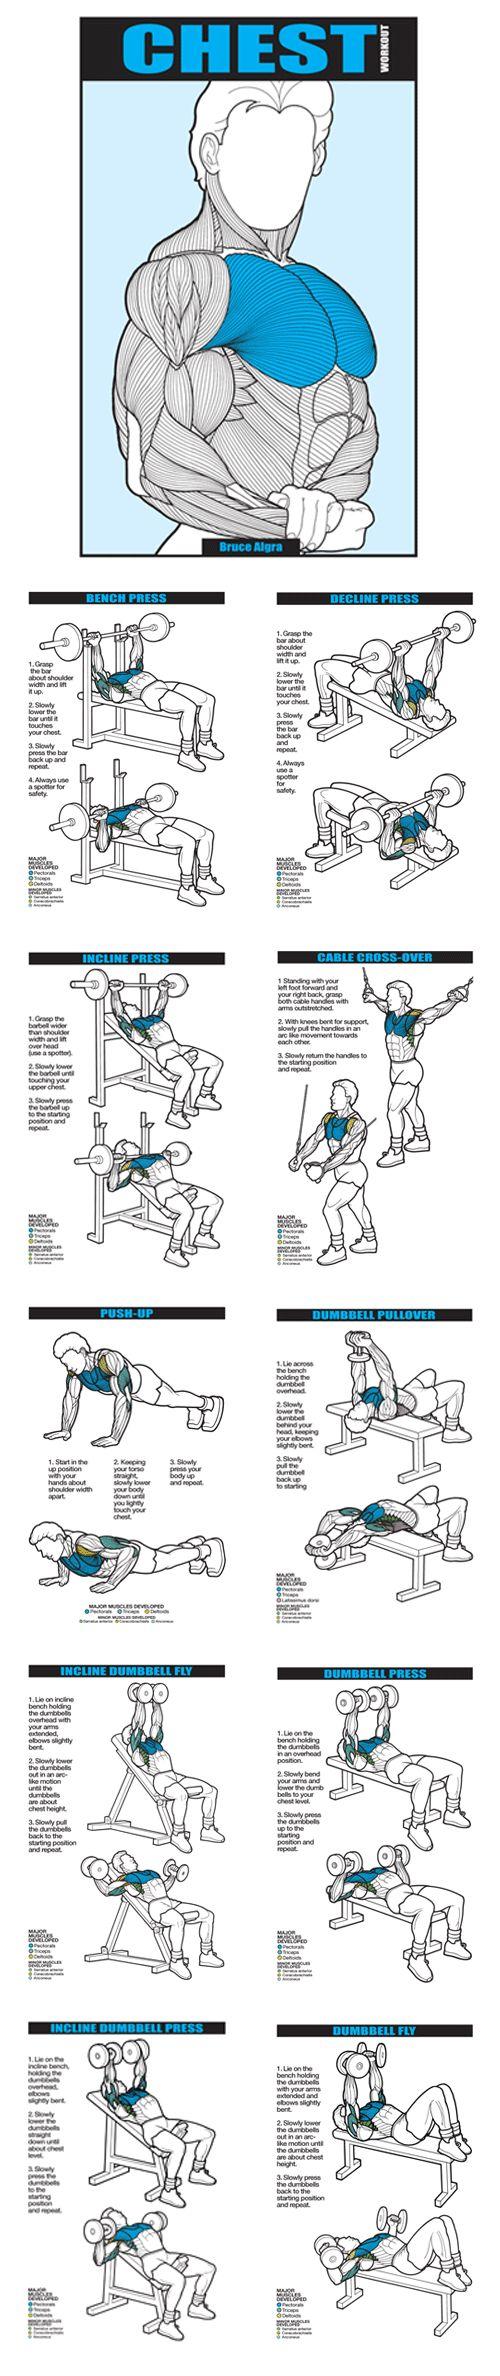 chest workouts http://www.ebay.com/itm/Omus-white-powder-gold-MONATOMIC-GOLD-30-Count-/221917739670?